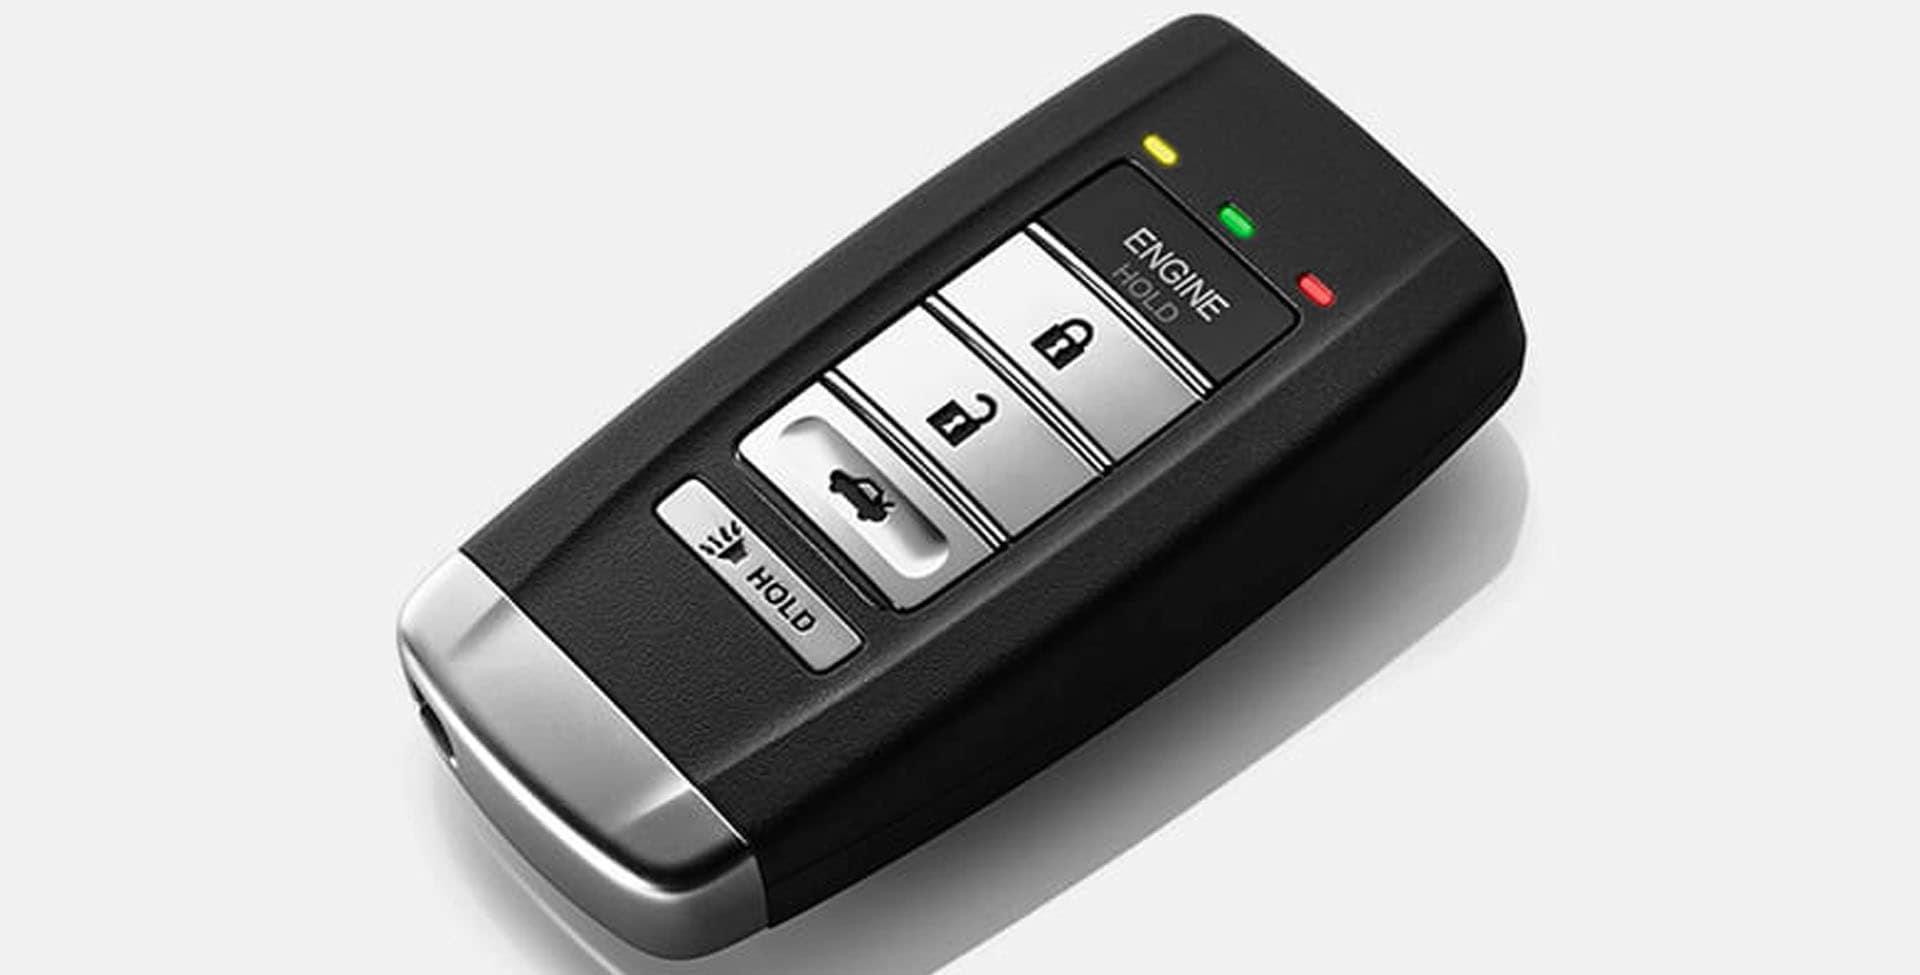 Acura MDX remote starter